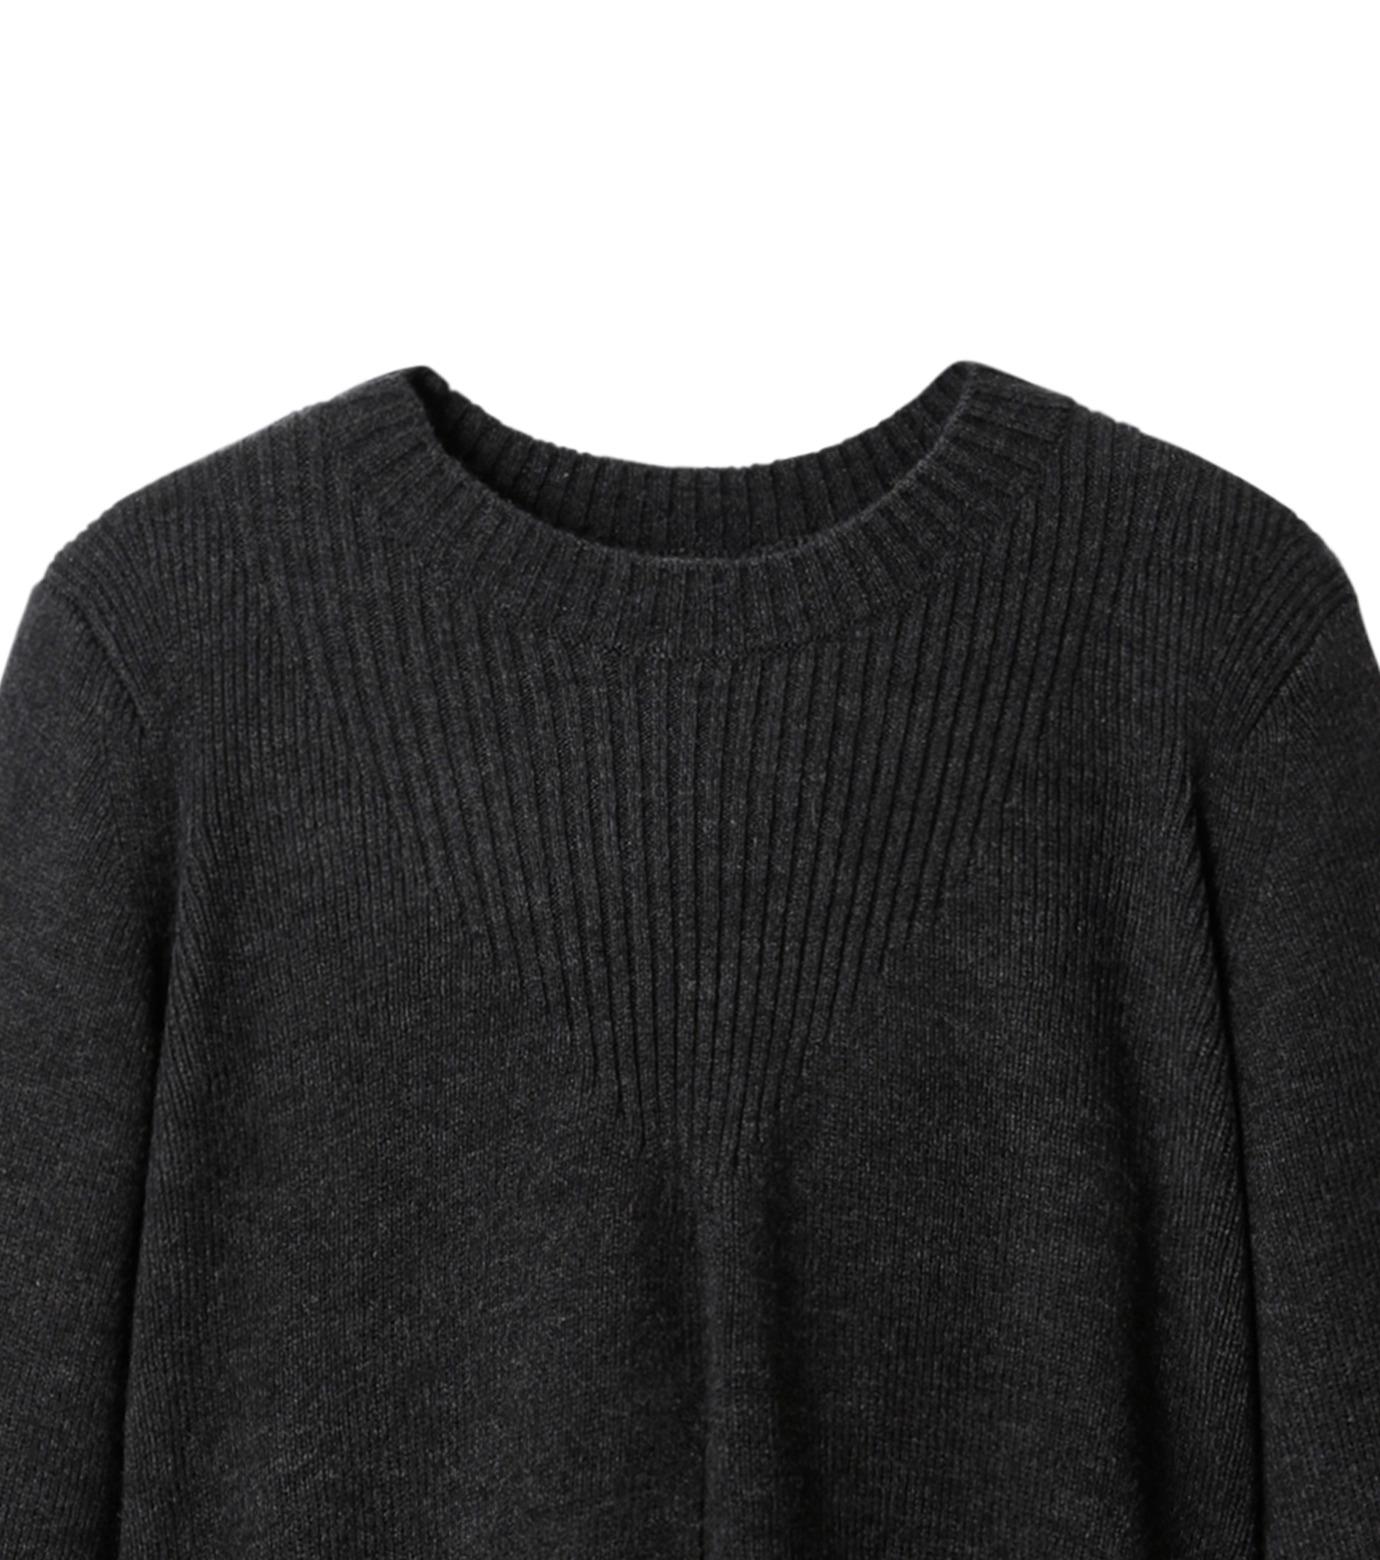 AKANE UTSUNOMIYA(アカネウツノミヤ)のAsymmetry Knit Pullover-BLACK(ニット/knit)-W16FK221010-13 拡大詳細画像2